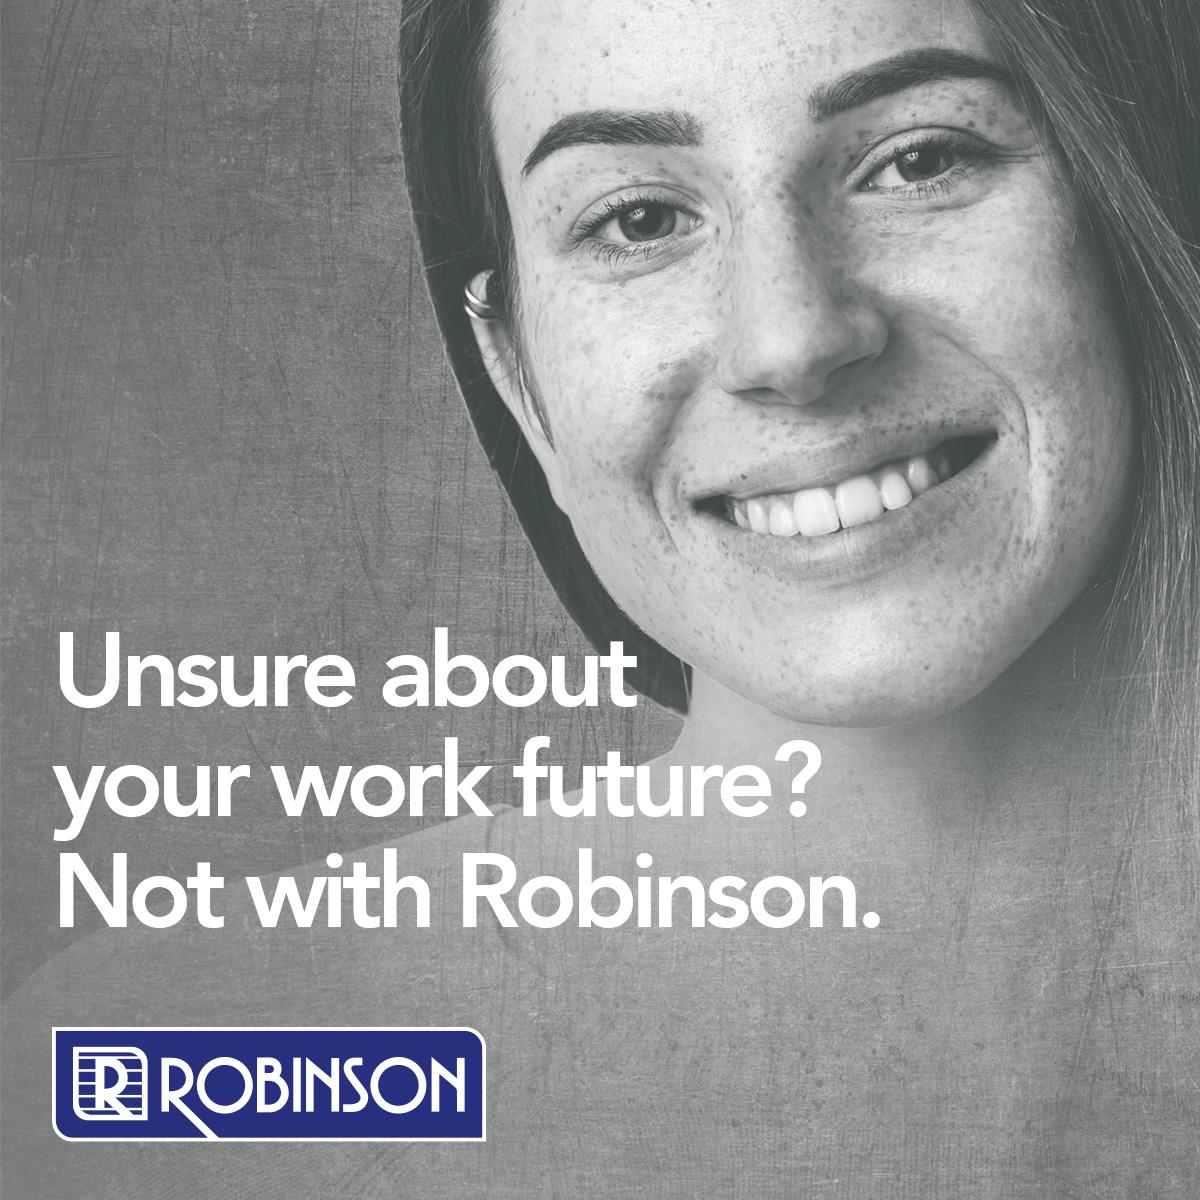 Stability-Robinson-Recruitment-2021-UnsureFuture